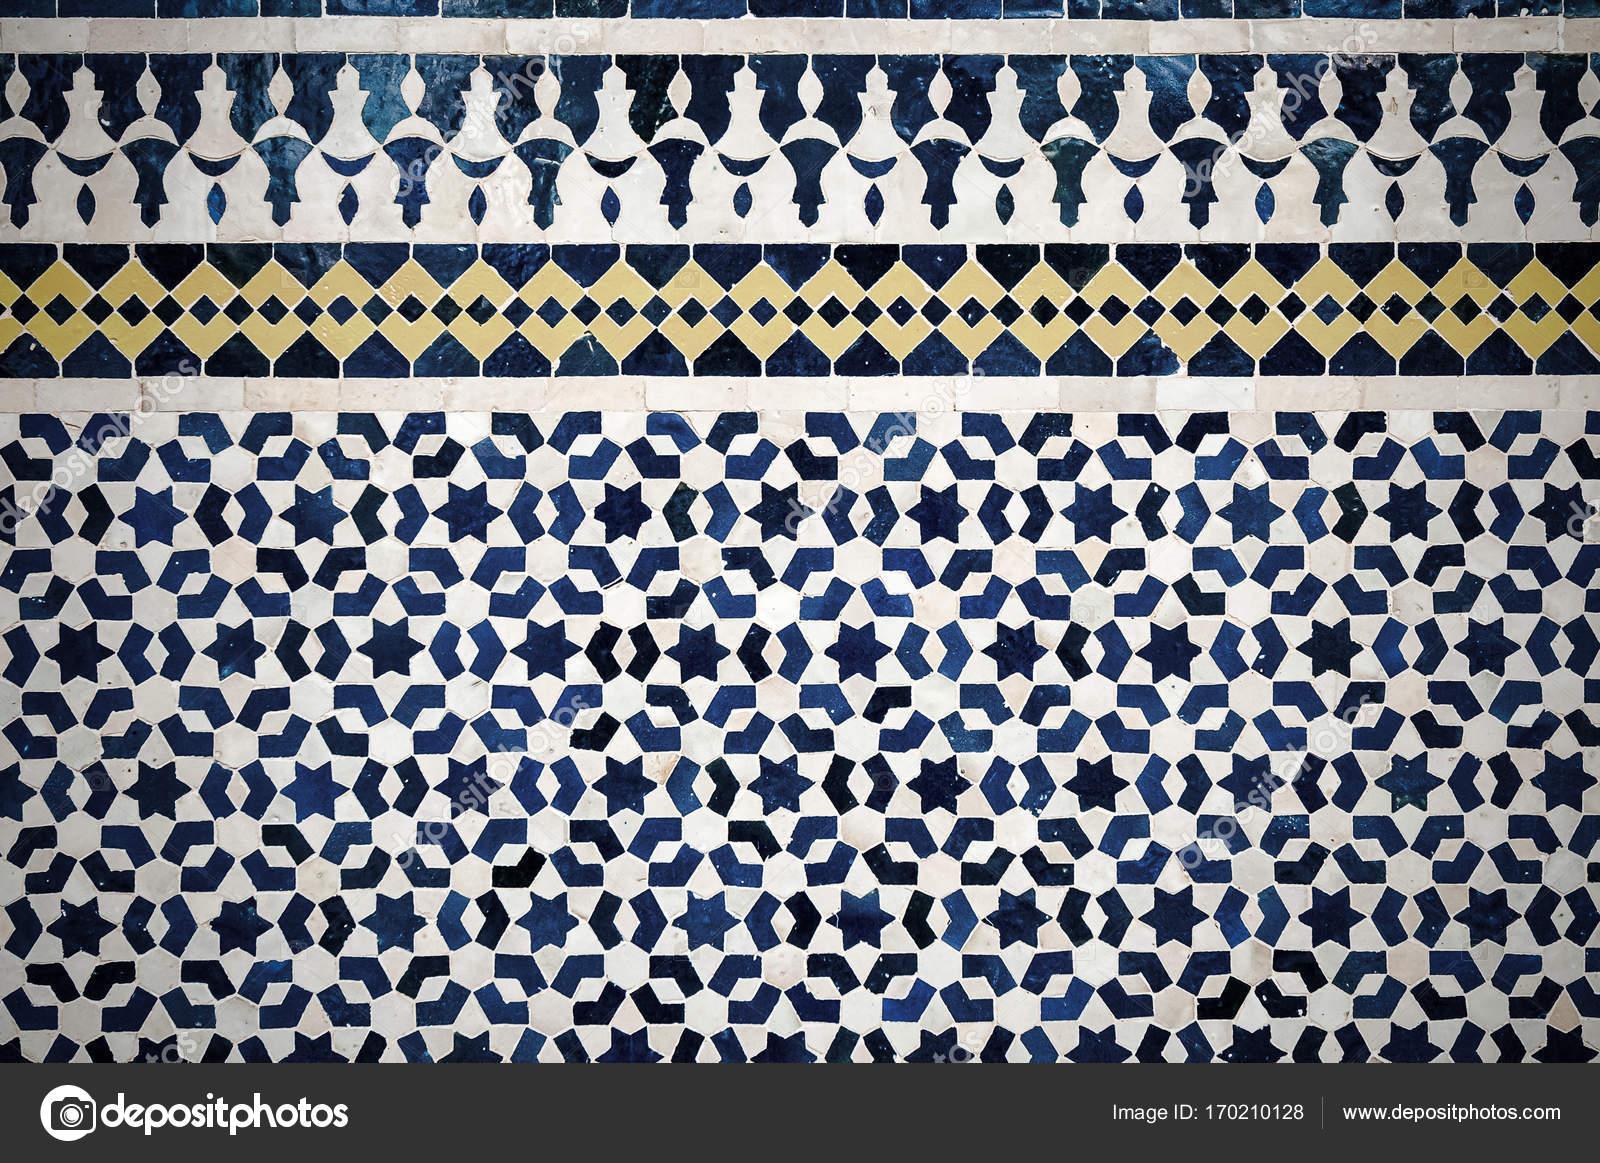 Piastrelle marocchine sfondo u2014 foto stock © javarman #170210128